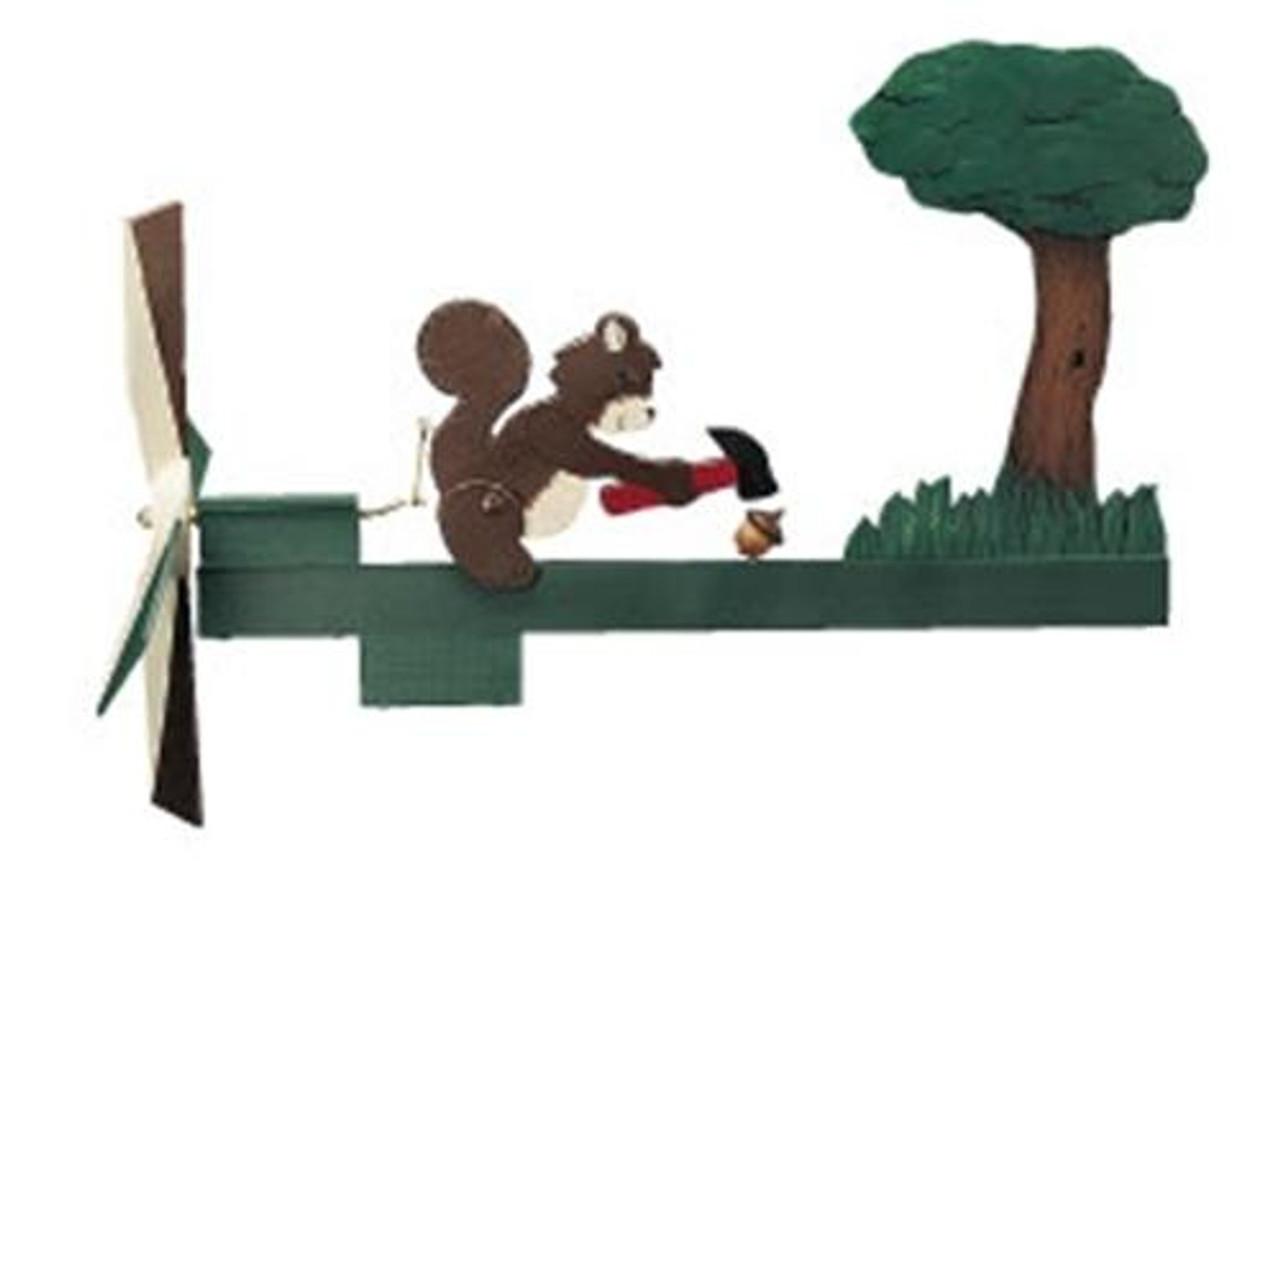 Cherry Tree Toys Squirrel Nutcracker Whirligig Plan